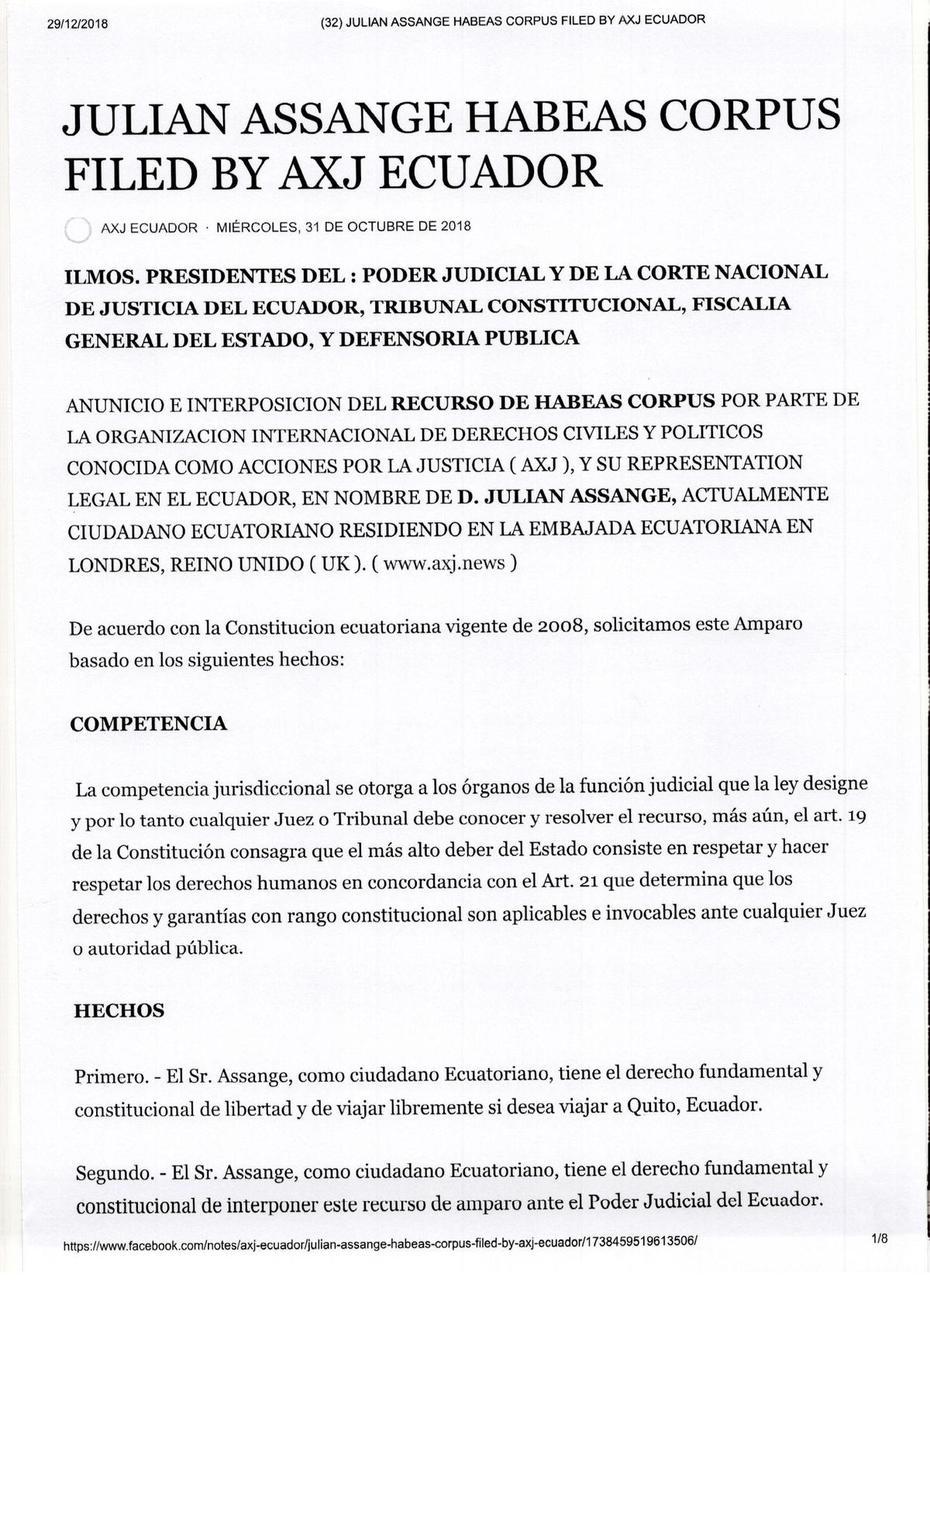 JULIAN ASSANGE HABEAS CORPUS FILED BY AXJ ECUADOR